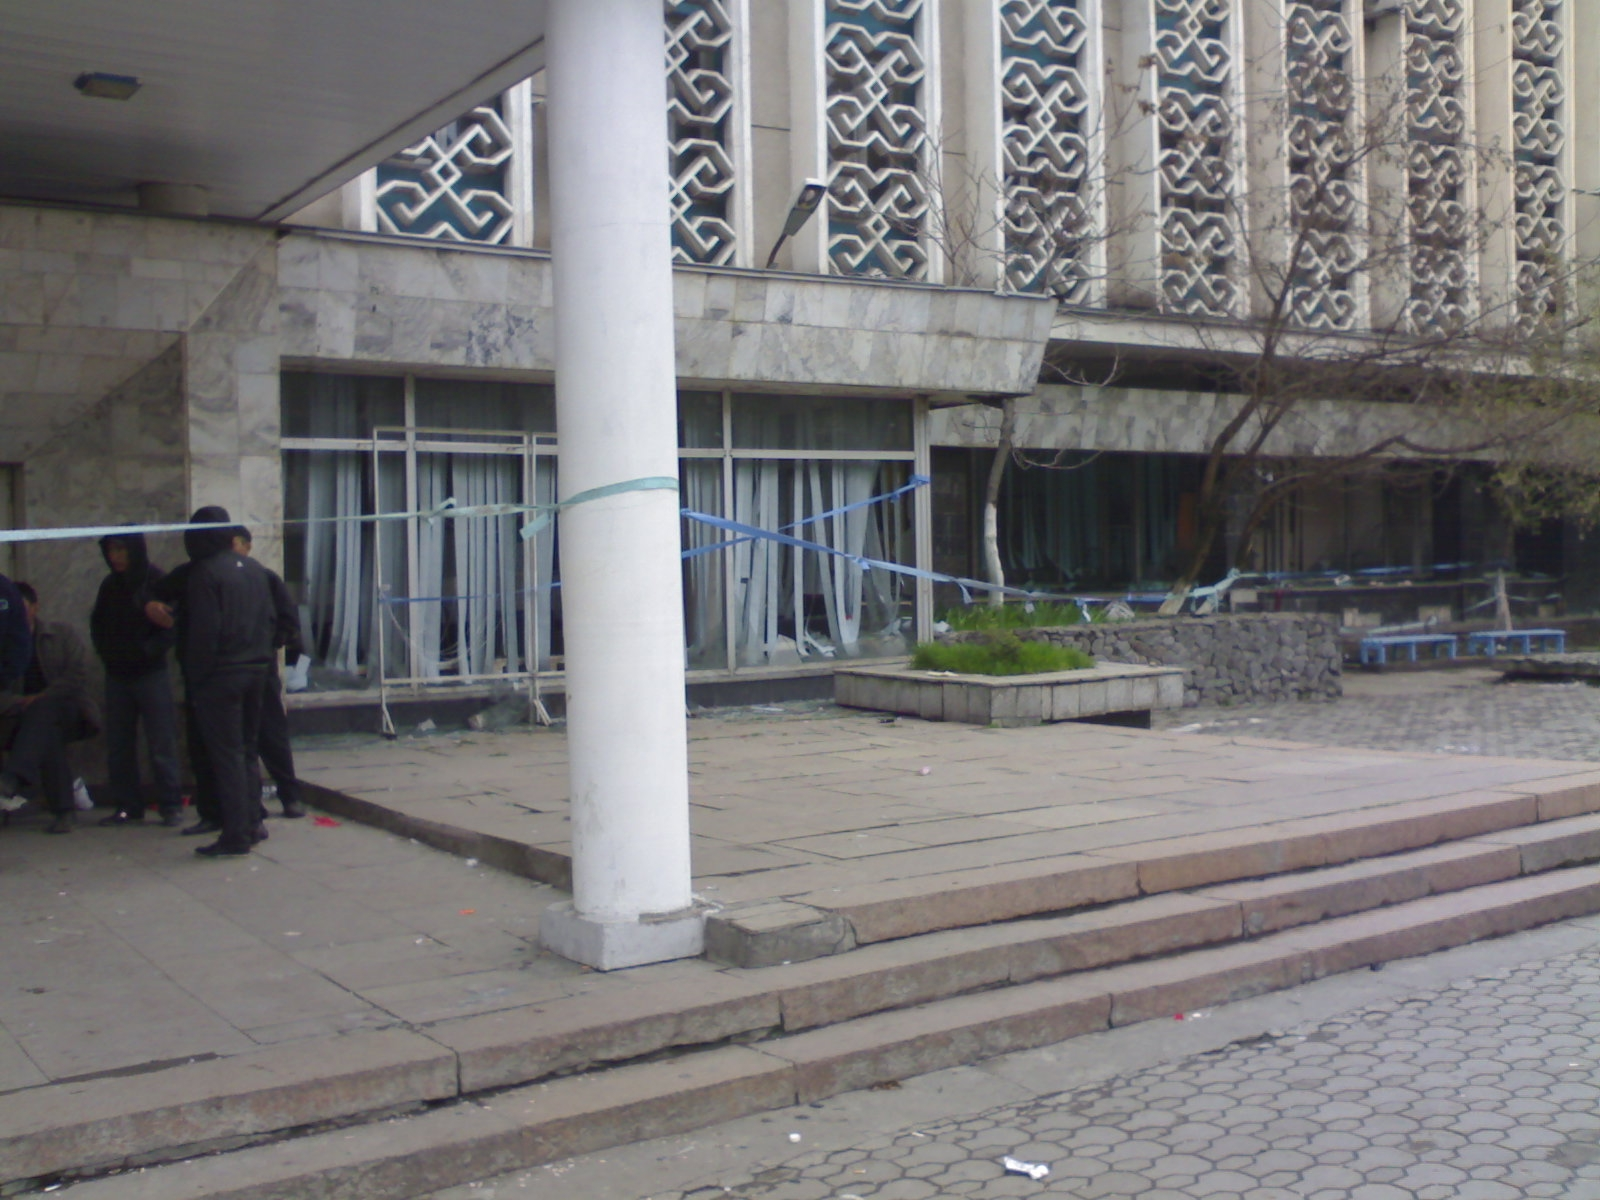 003. Центральный вход КГТРК